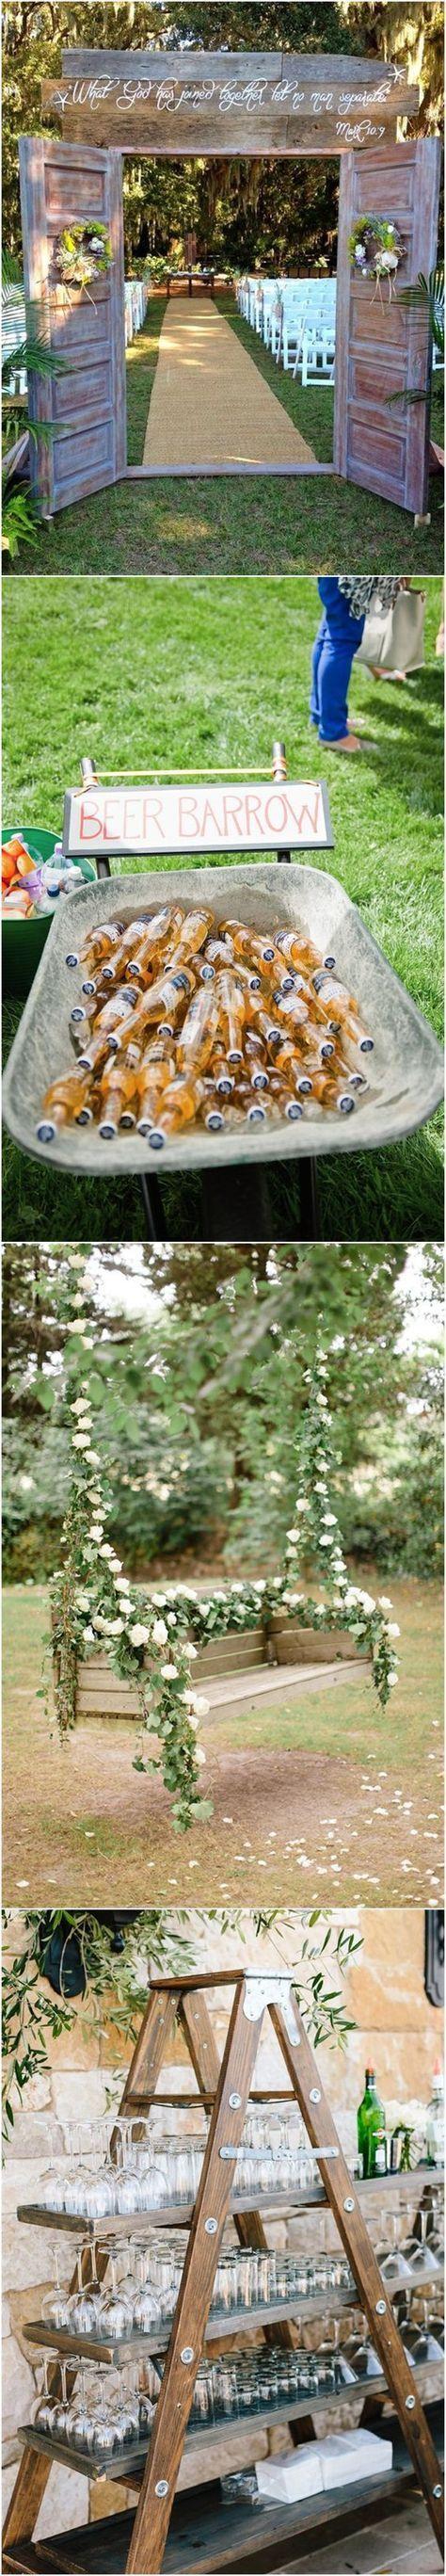 Wedding Decorations » 22 Rustic Backyard Wedding ...